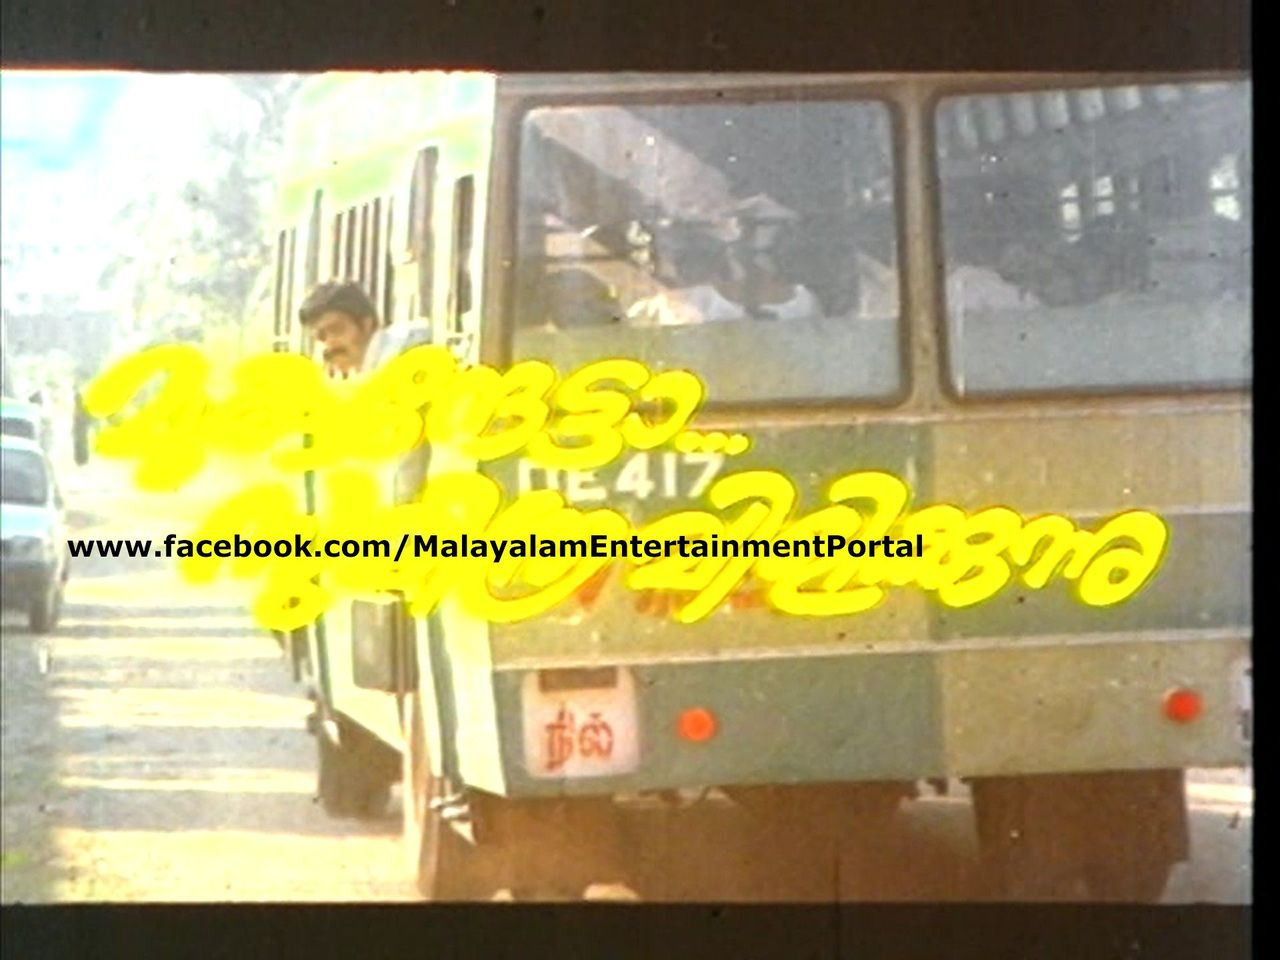 Mukundetta Sumithra Vilikyunnu Saina DVD Screenshots Bscap0003